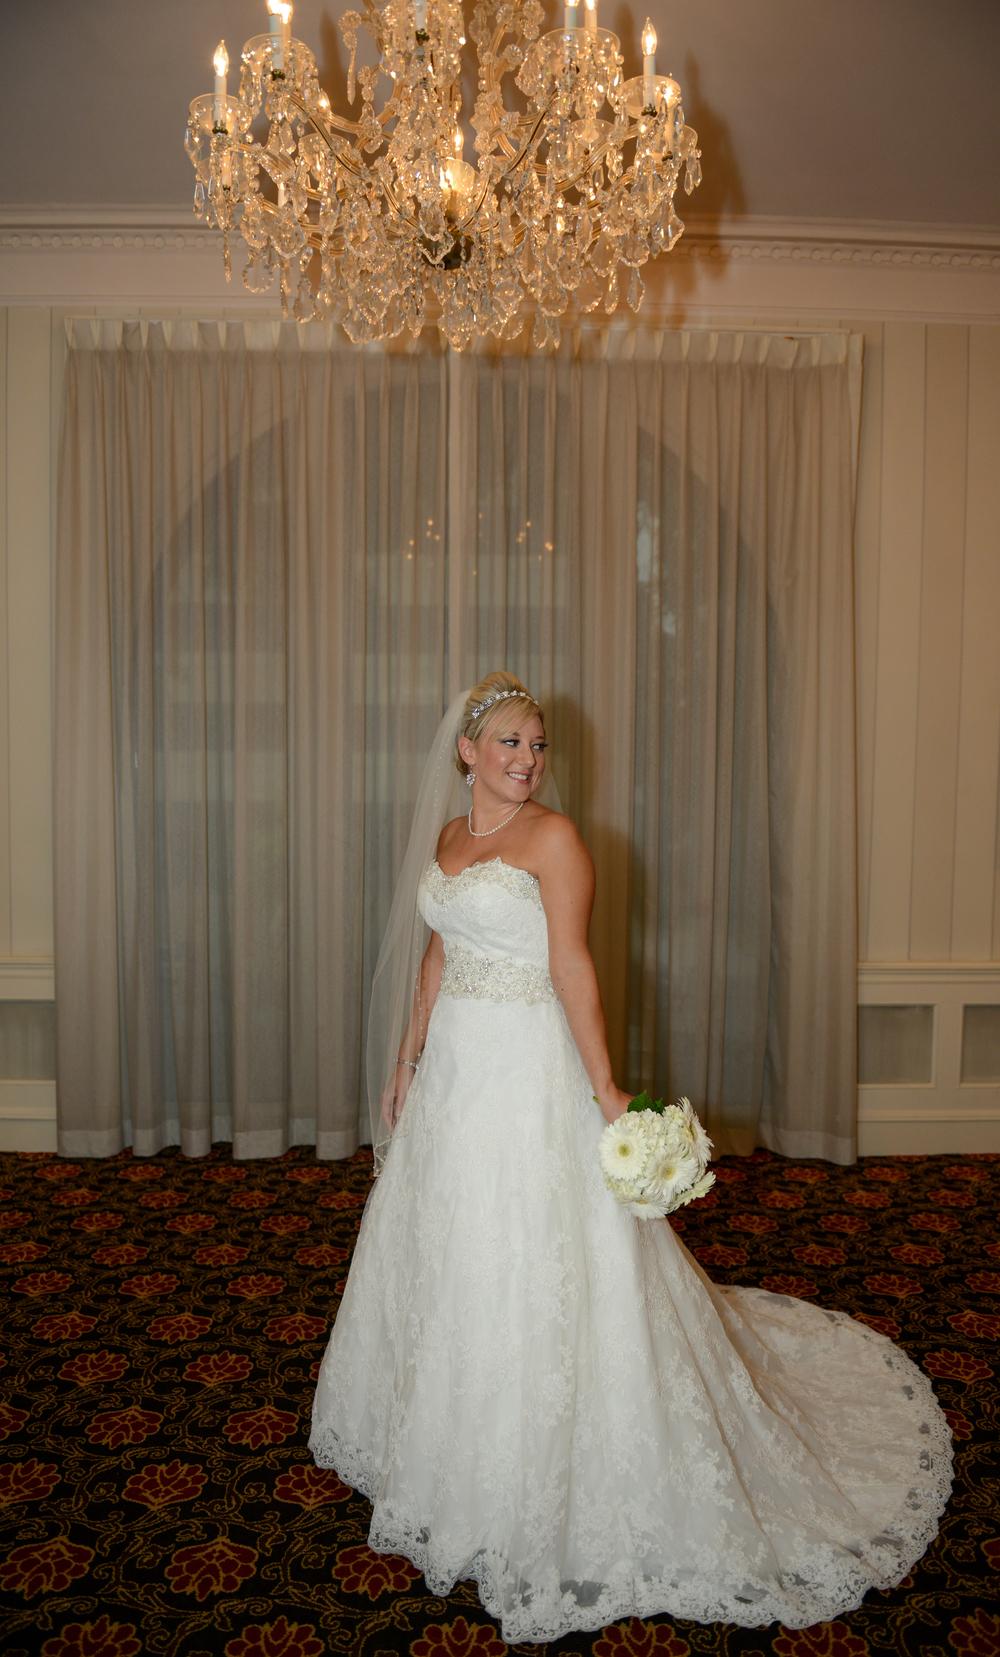 Lindsay-Street-Hall-Wedding-11.jpg